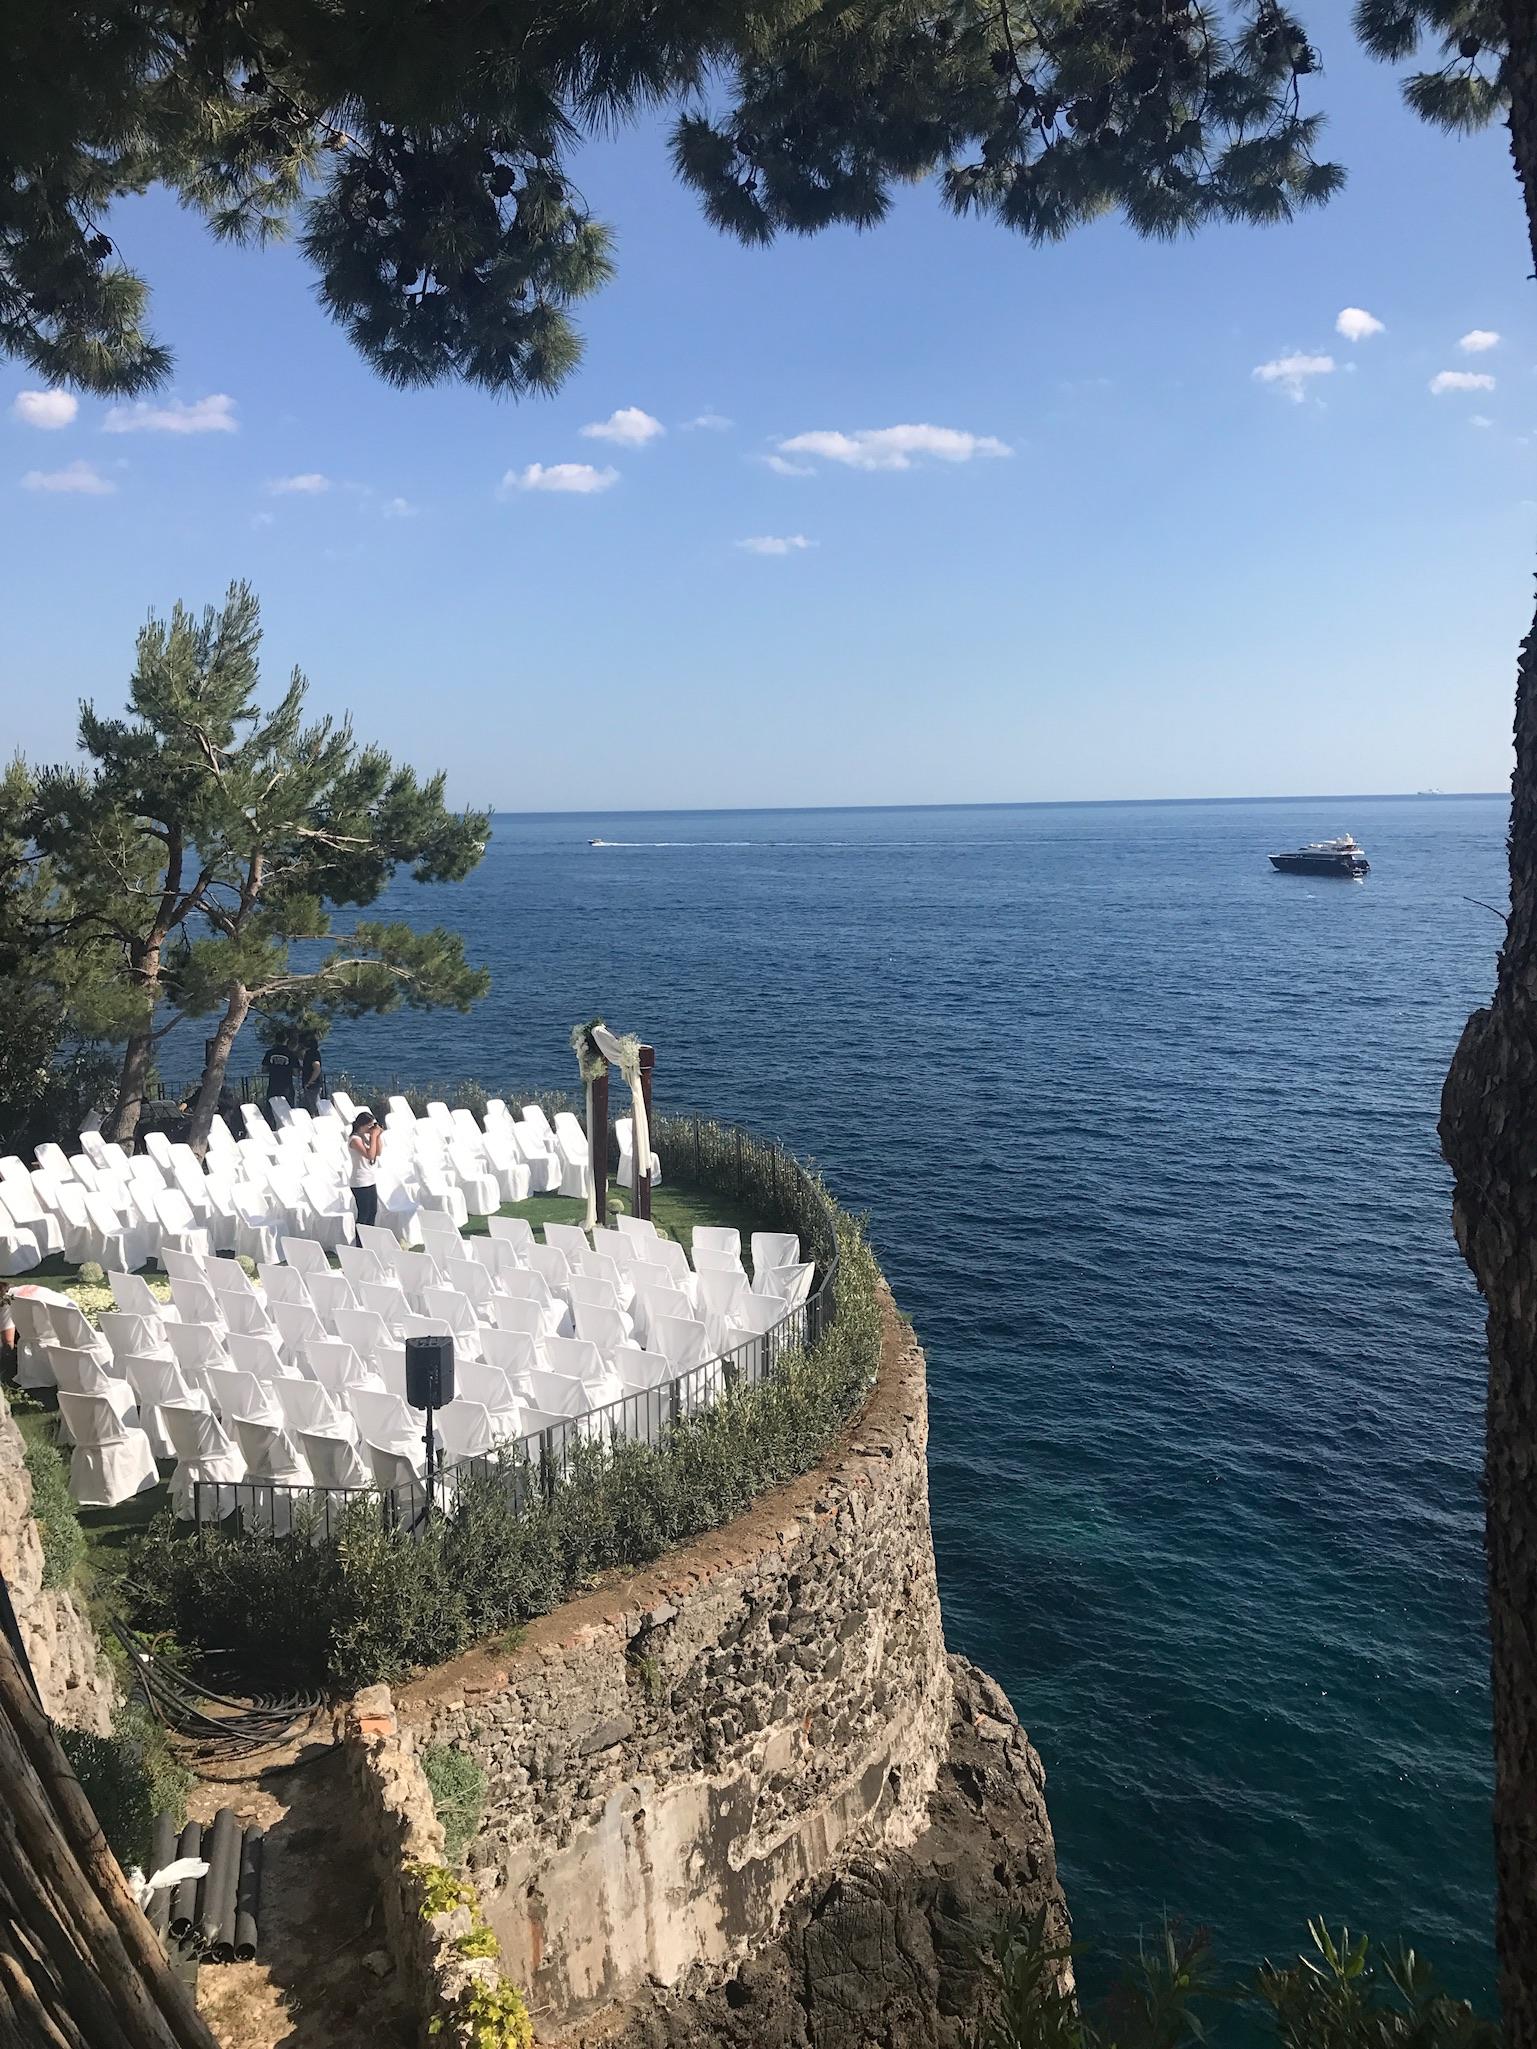 http://www.weddingamalfi.com/wp-content/uploads/Nathalie-and-Benjamin-Wedding-in-Positano-Italy-1.jpg